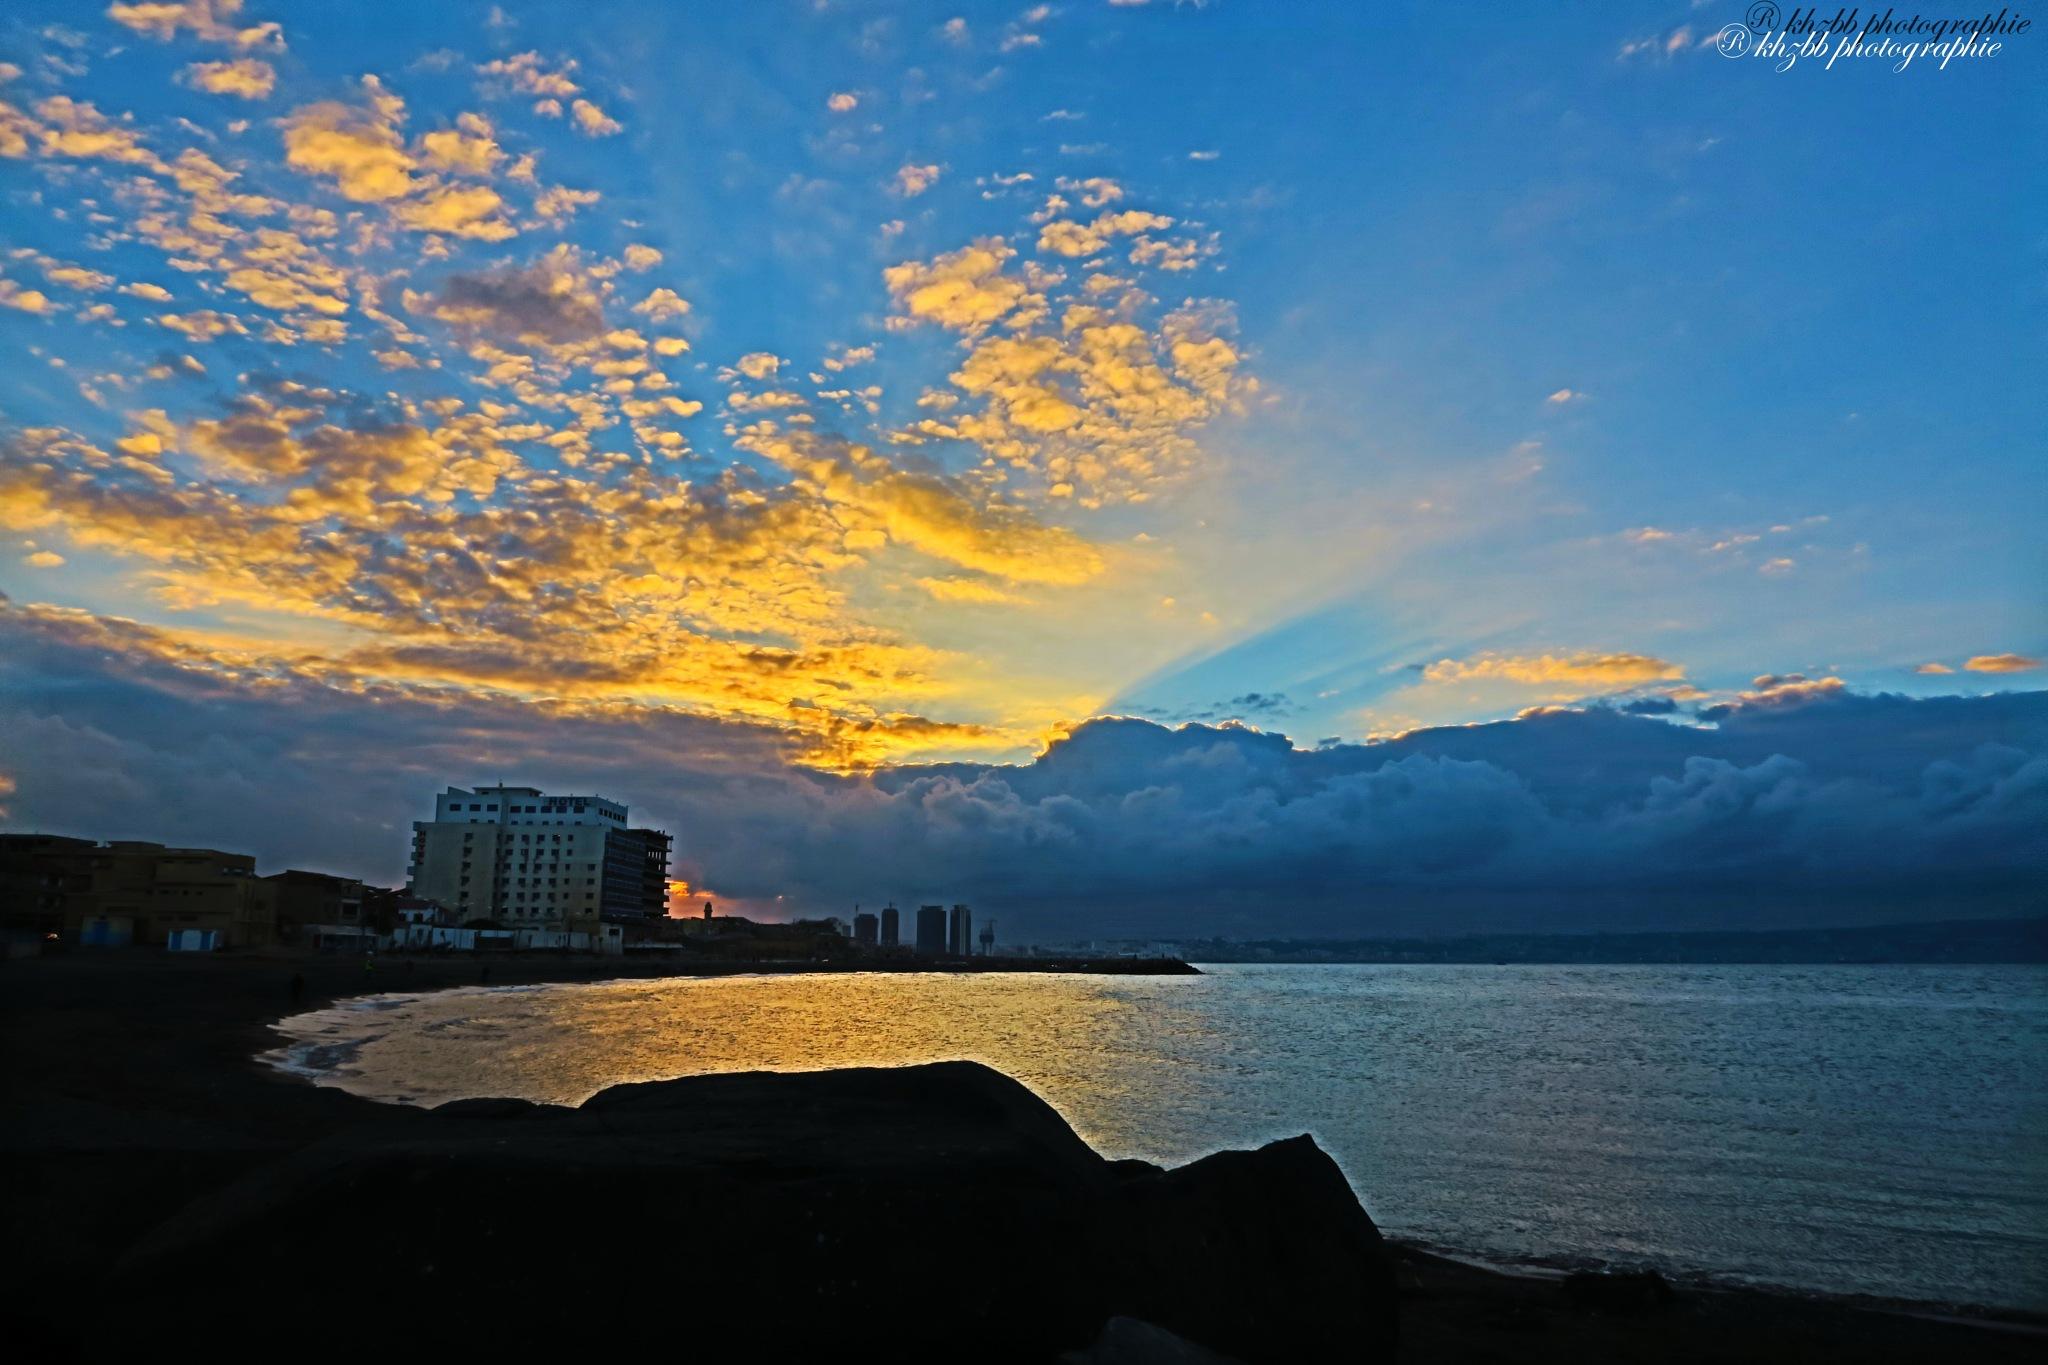 sunset by kherrazhbb